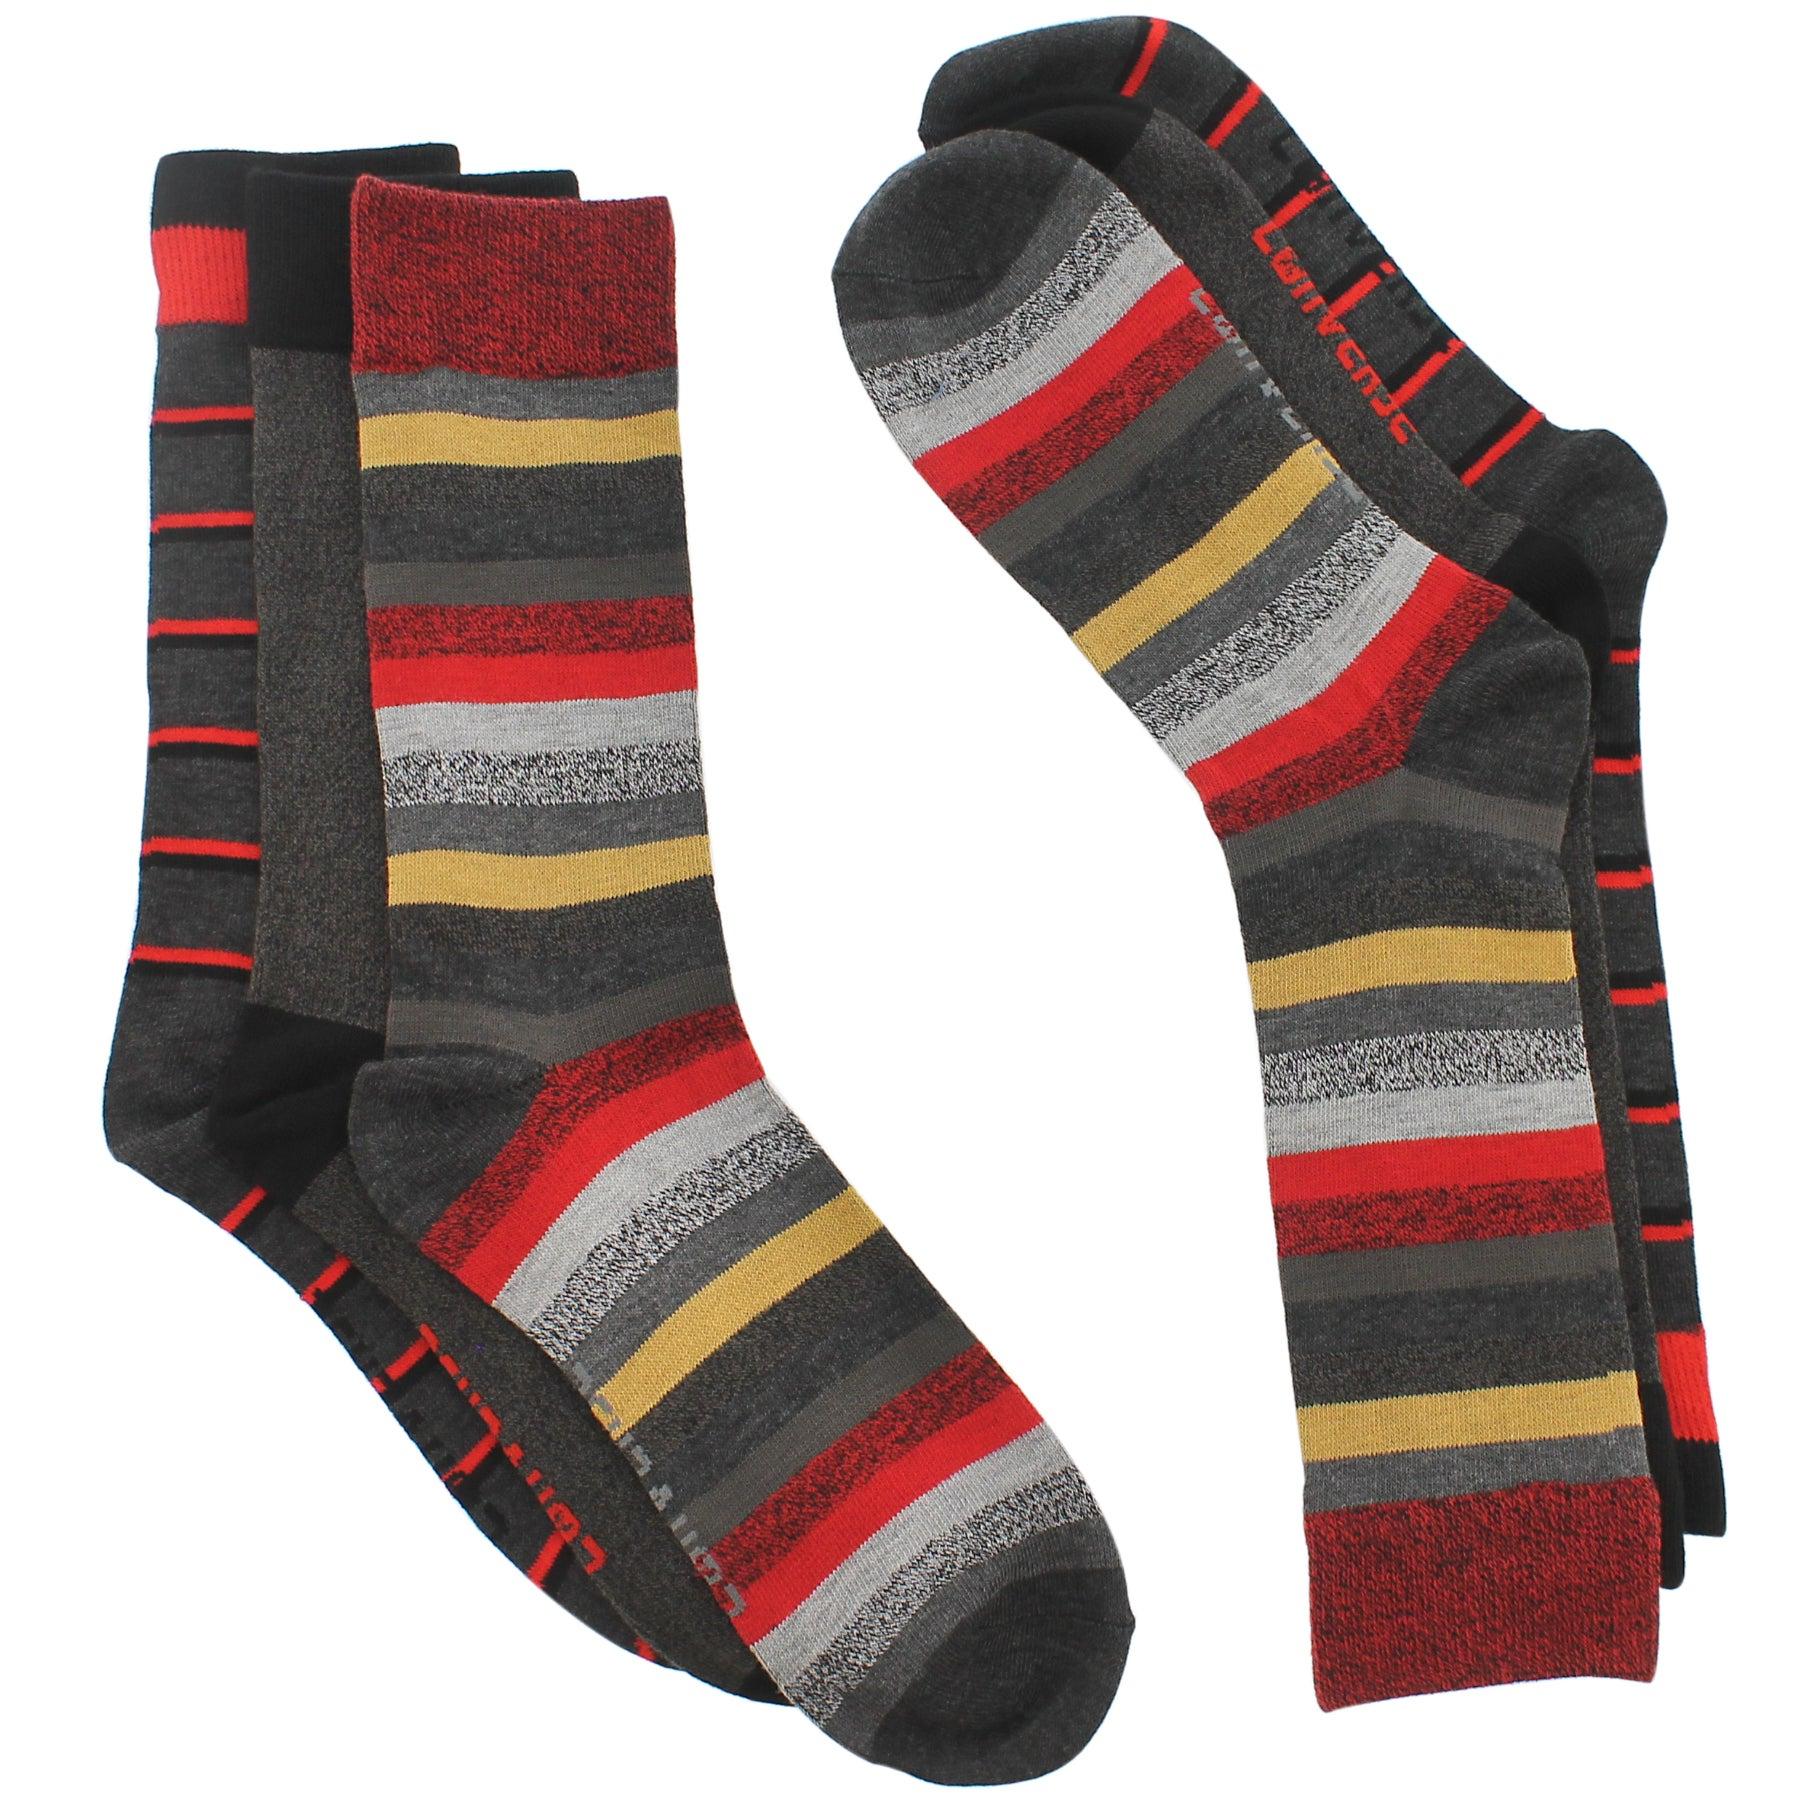 Mns Converse offair stripe crew sock 3pk